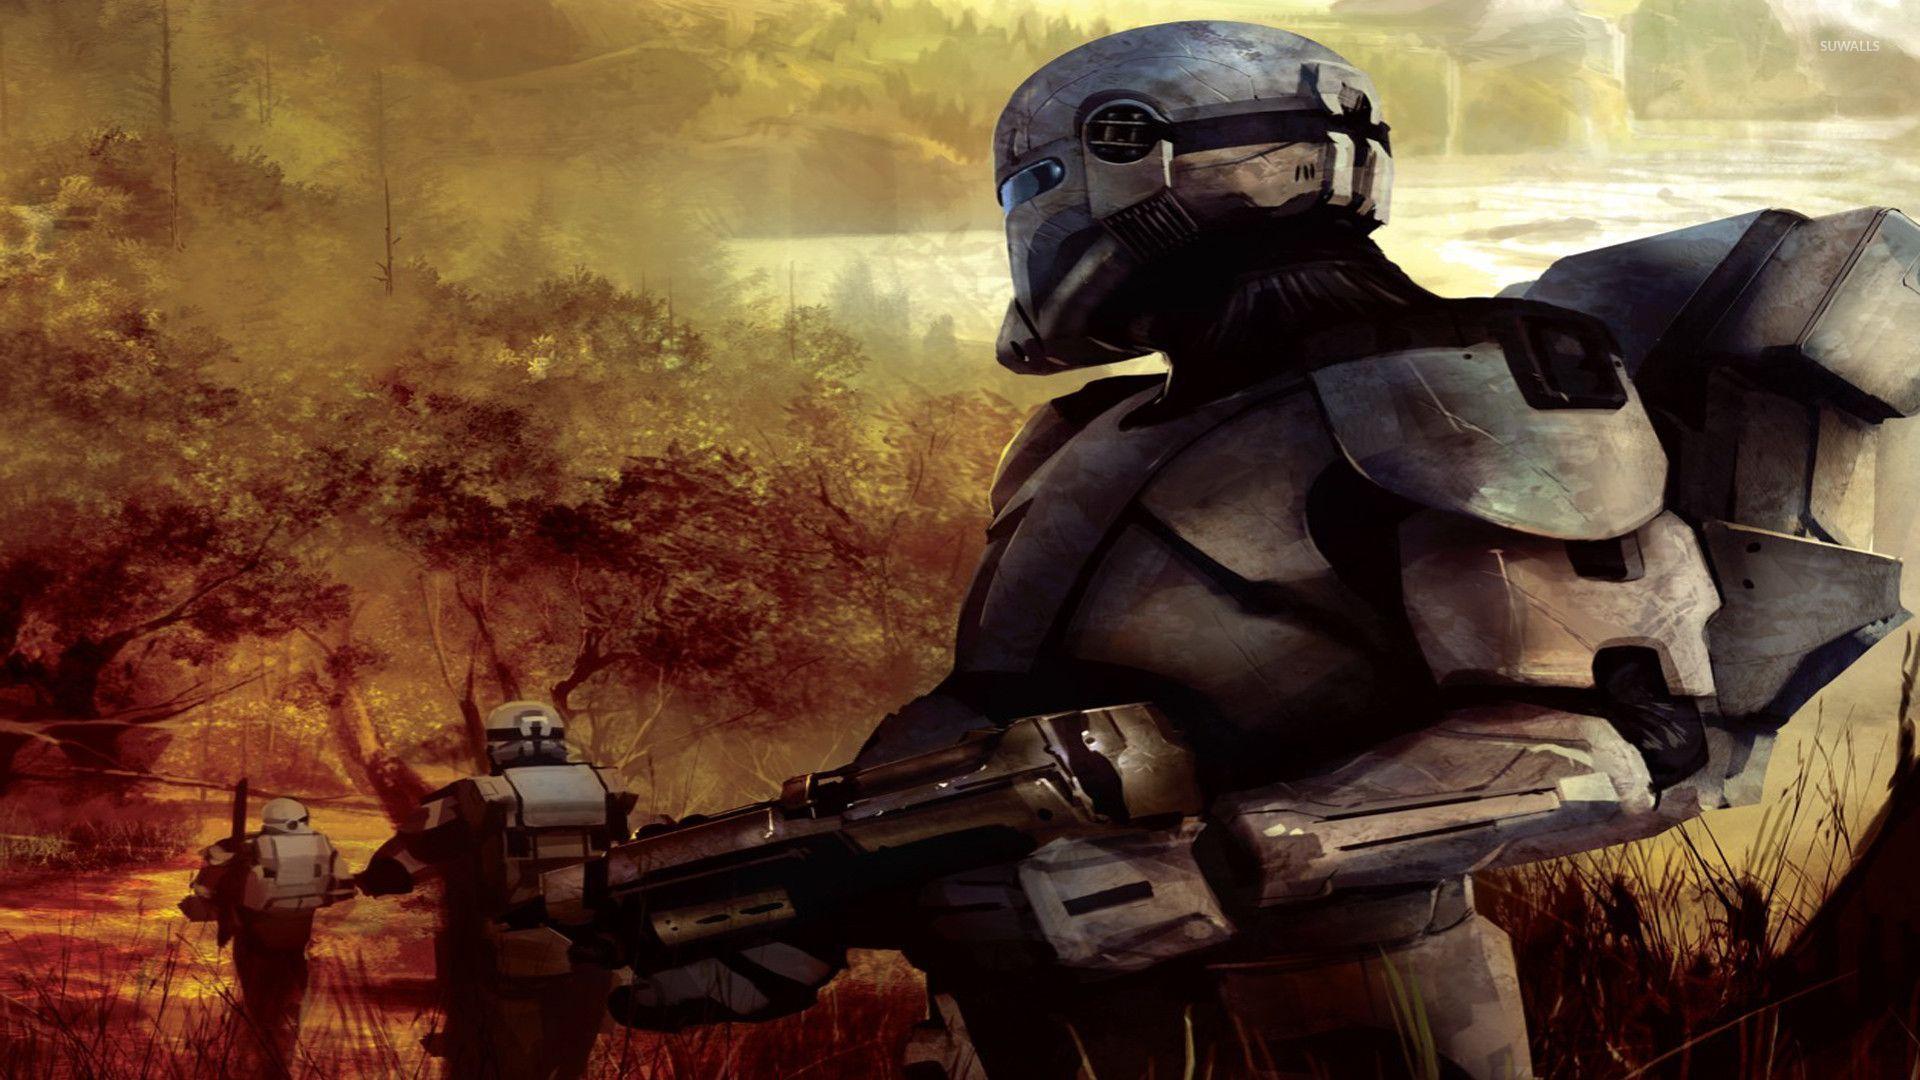 epic star wars trooper wallpaper - photo #37